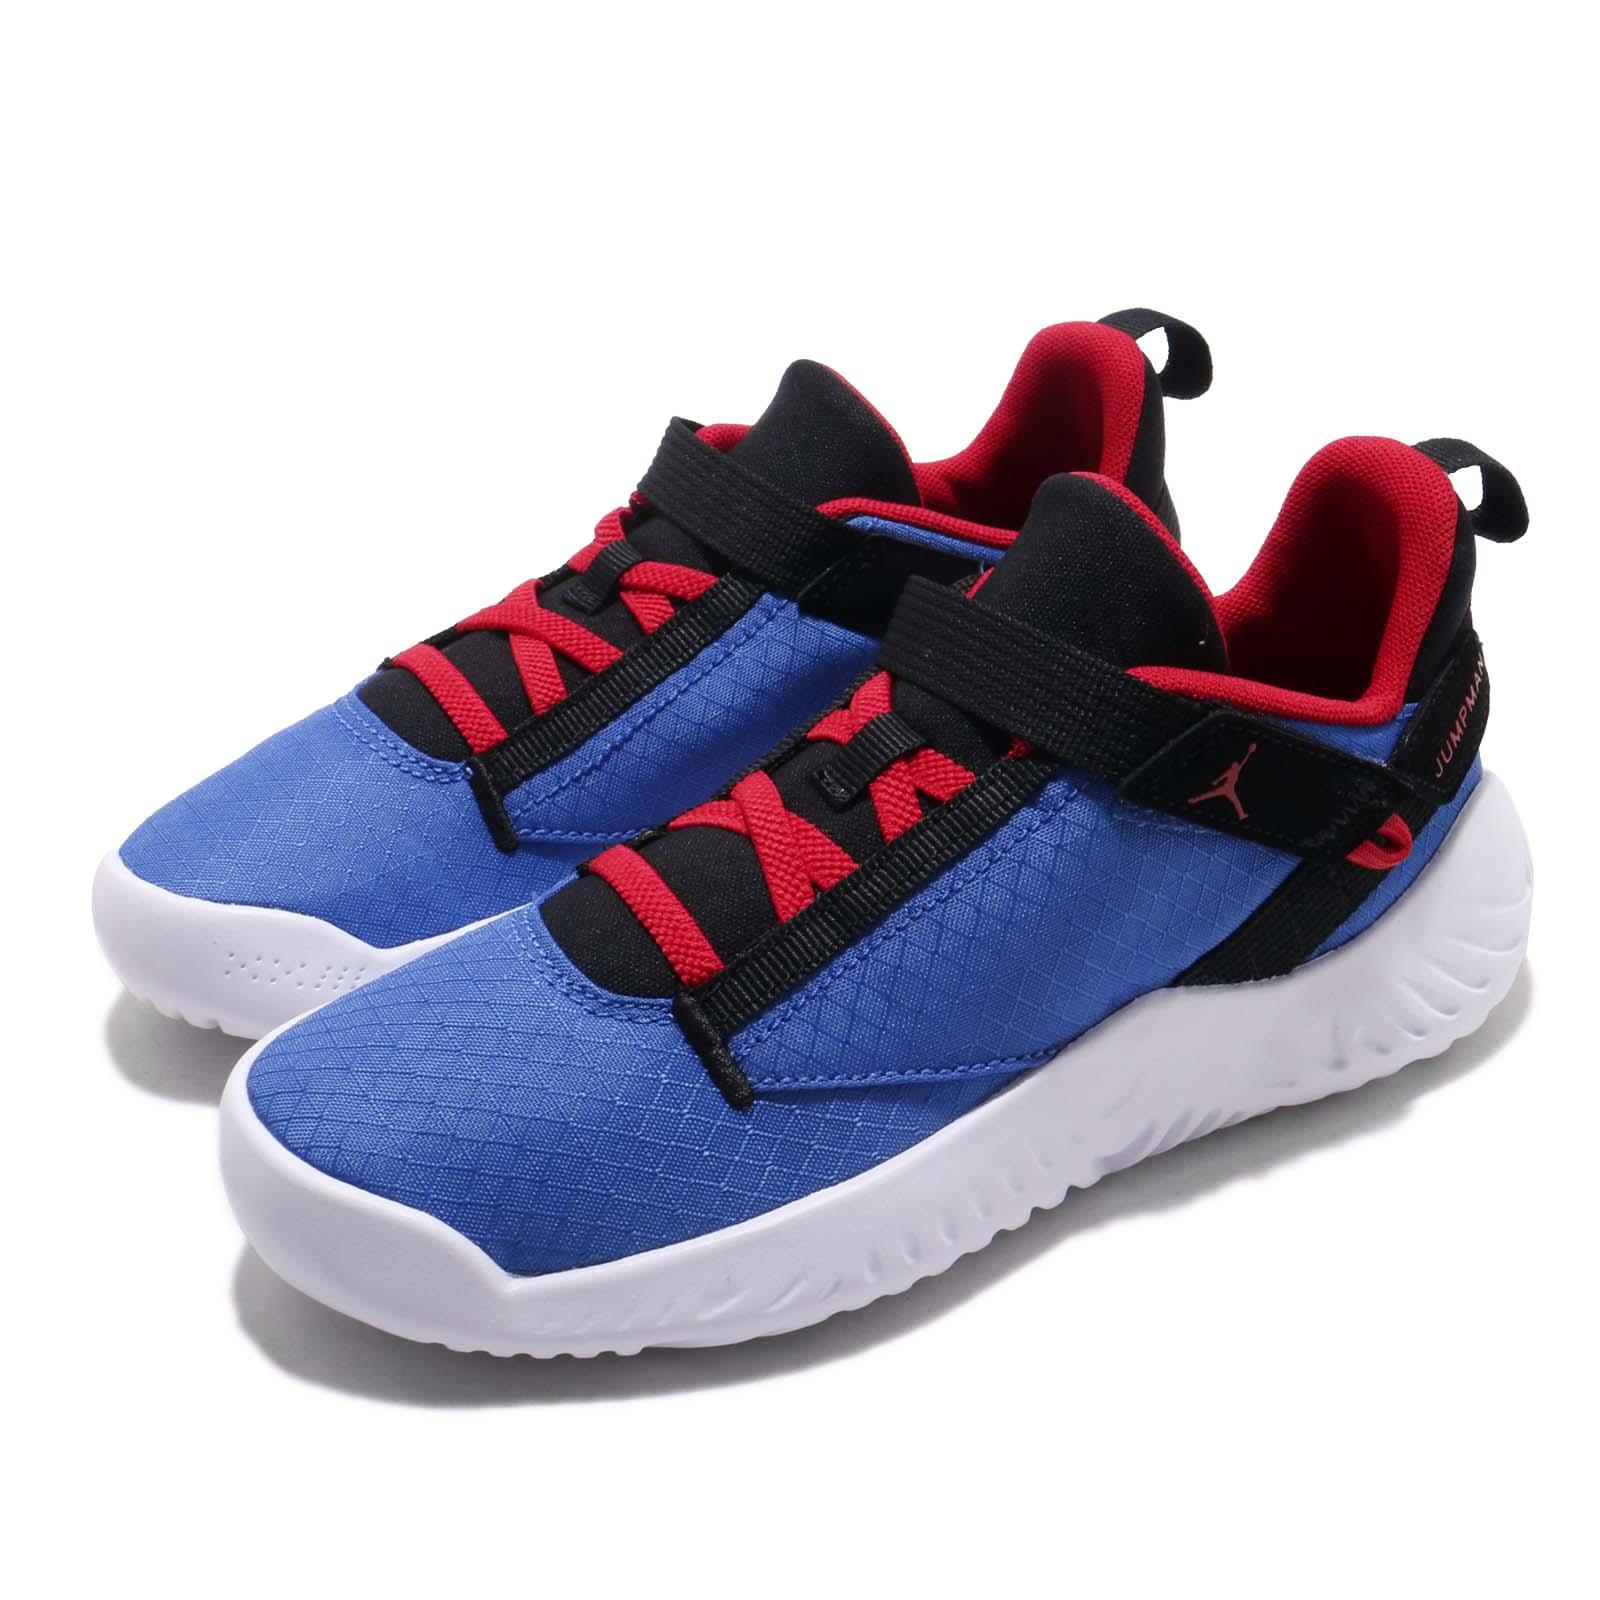 Nike 休閒鞋 Jordan Proto 23 運動 童鞋 AT5712-401